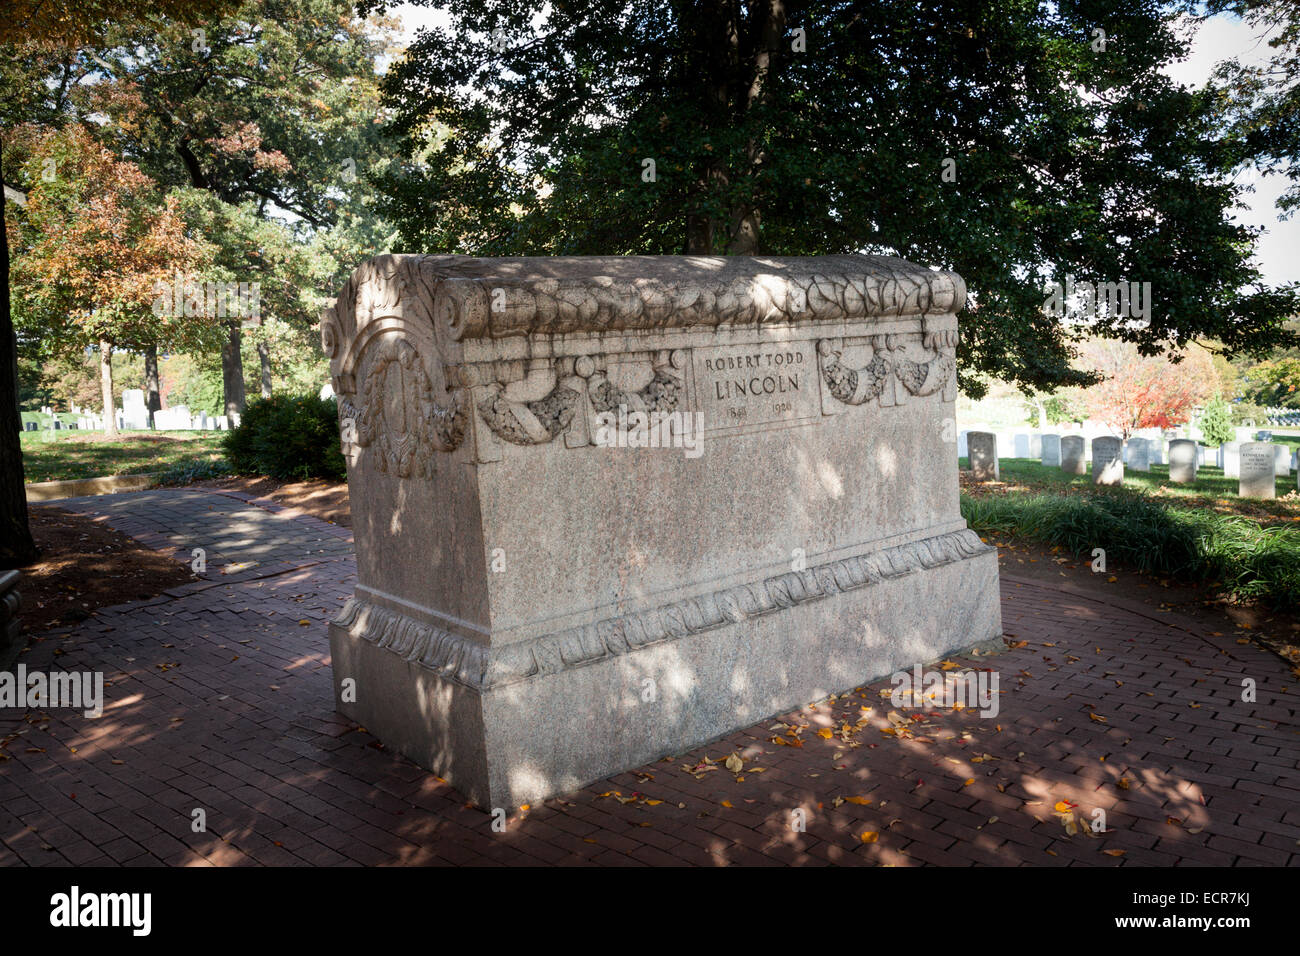 Grave of Robert Todd Lincoln, Arlington National Cemetery, Virginia - Stock Image